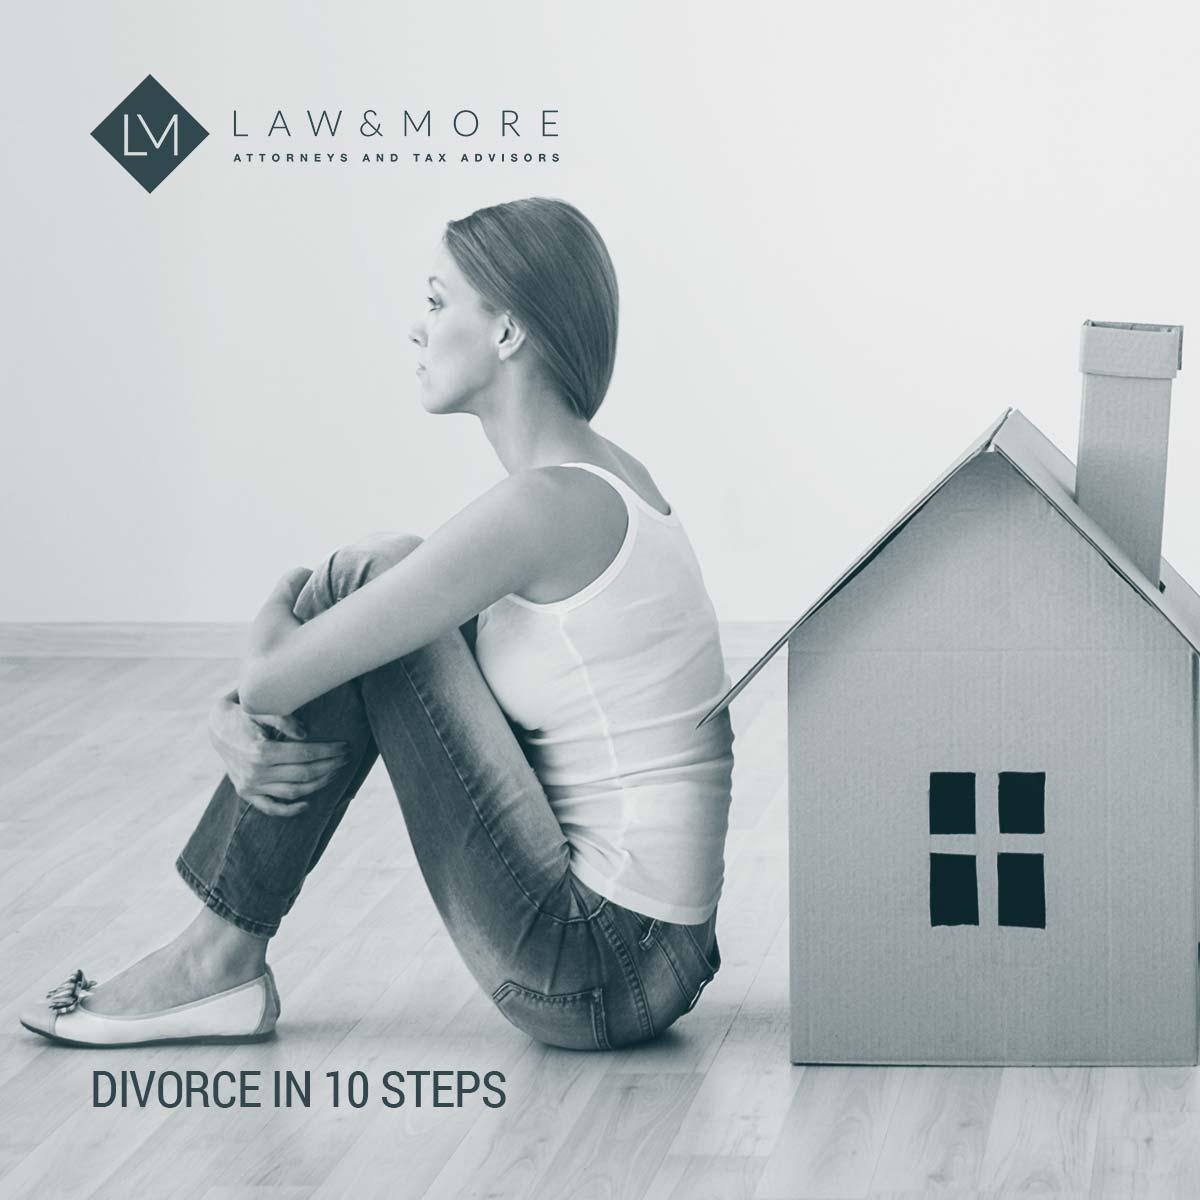 Razvod u 10 koraka